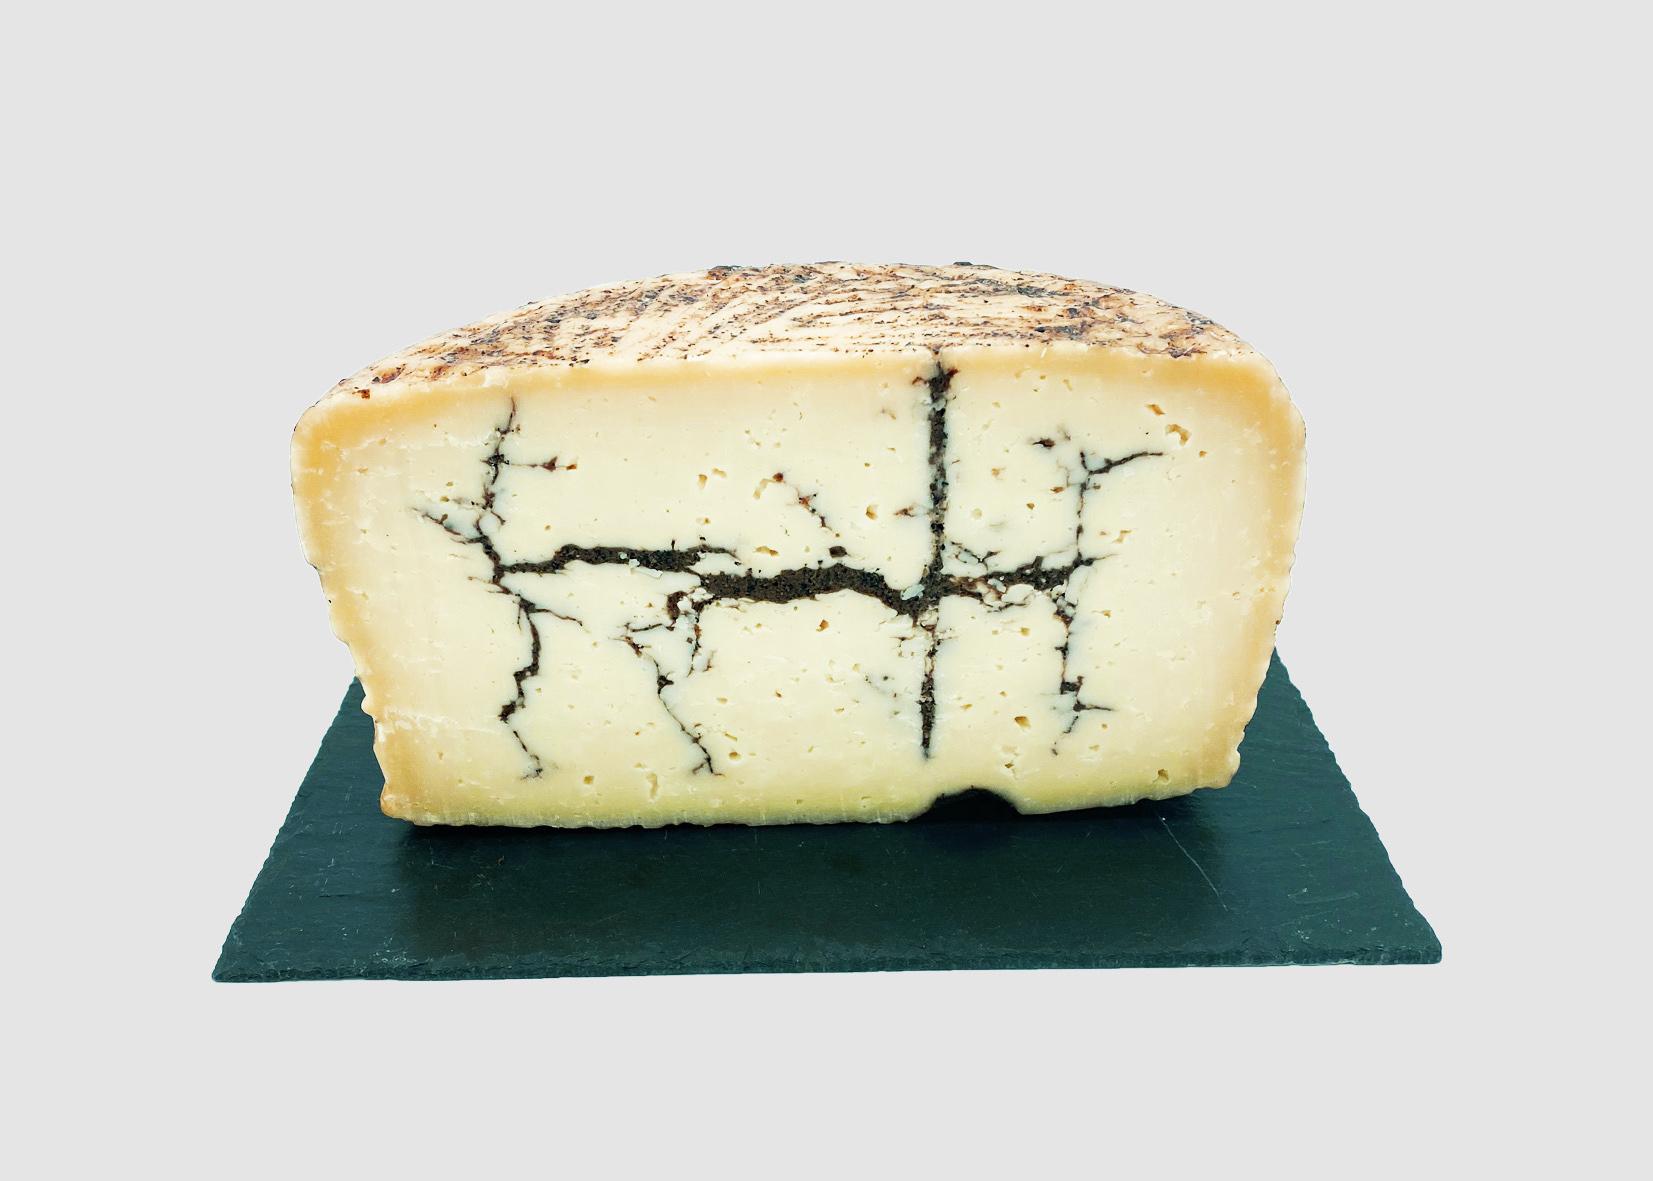 moliterno-al-tartufo-fromage-napoleon copie